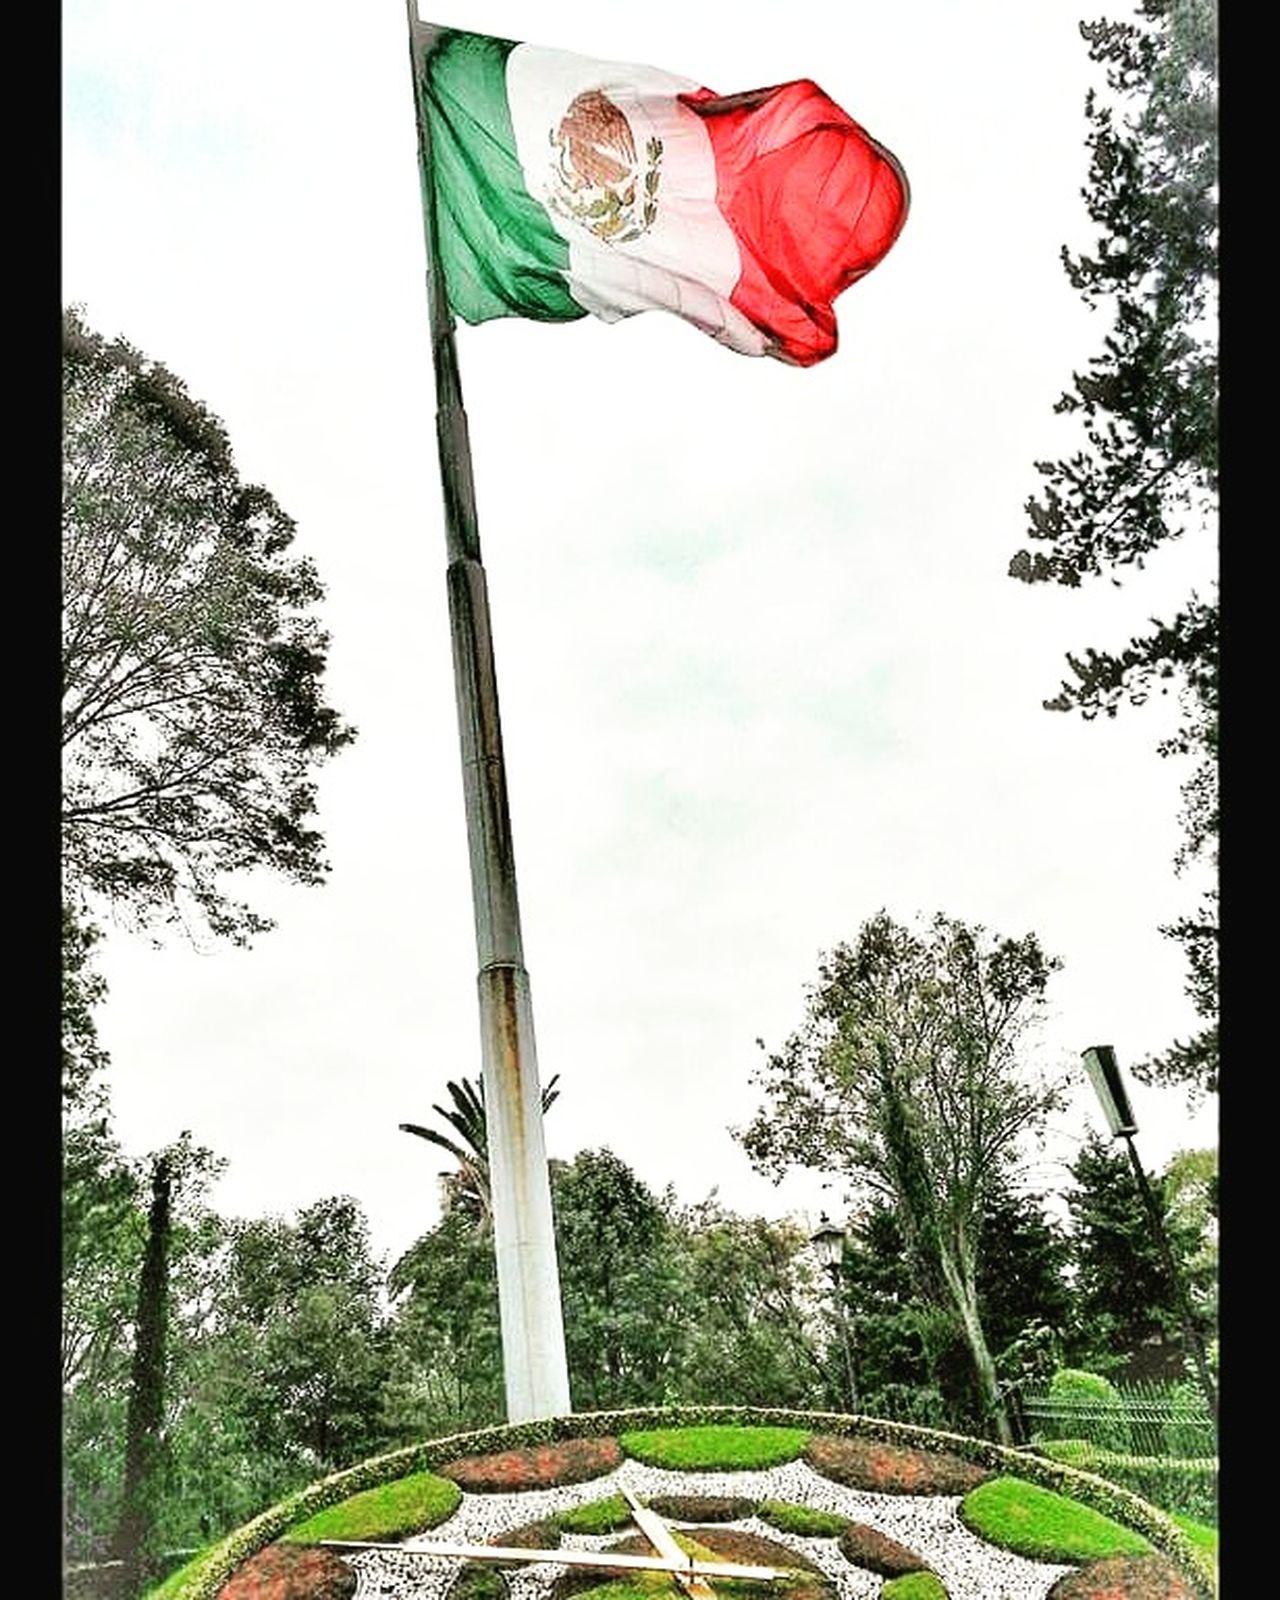 Ondeando Urban Scene Photooftheday Eye4photography  Eye4photography  EyeEm Best Shots Mexicodf Walking Around Mexicocity  Cdmx Enjoying Life Flags In The Wind